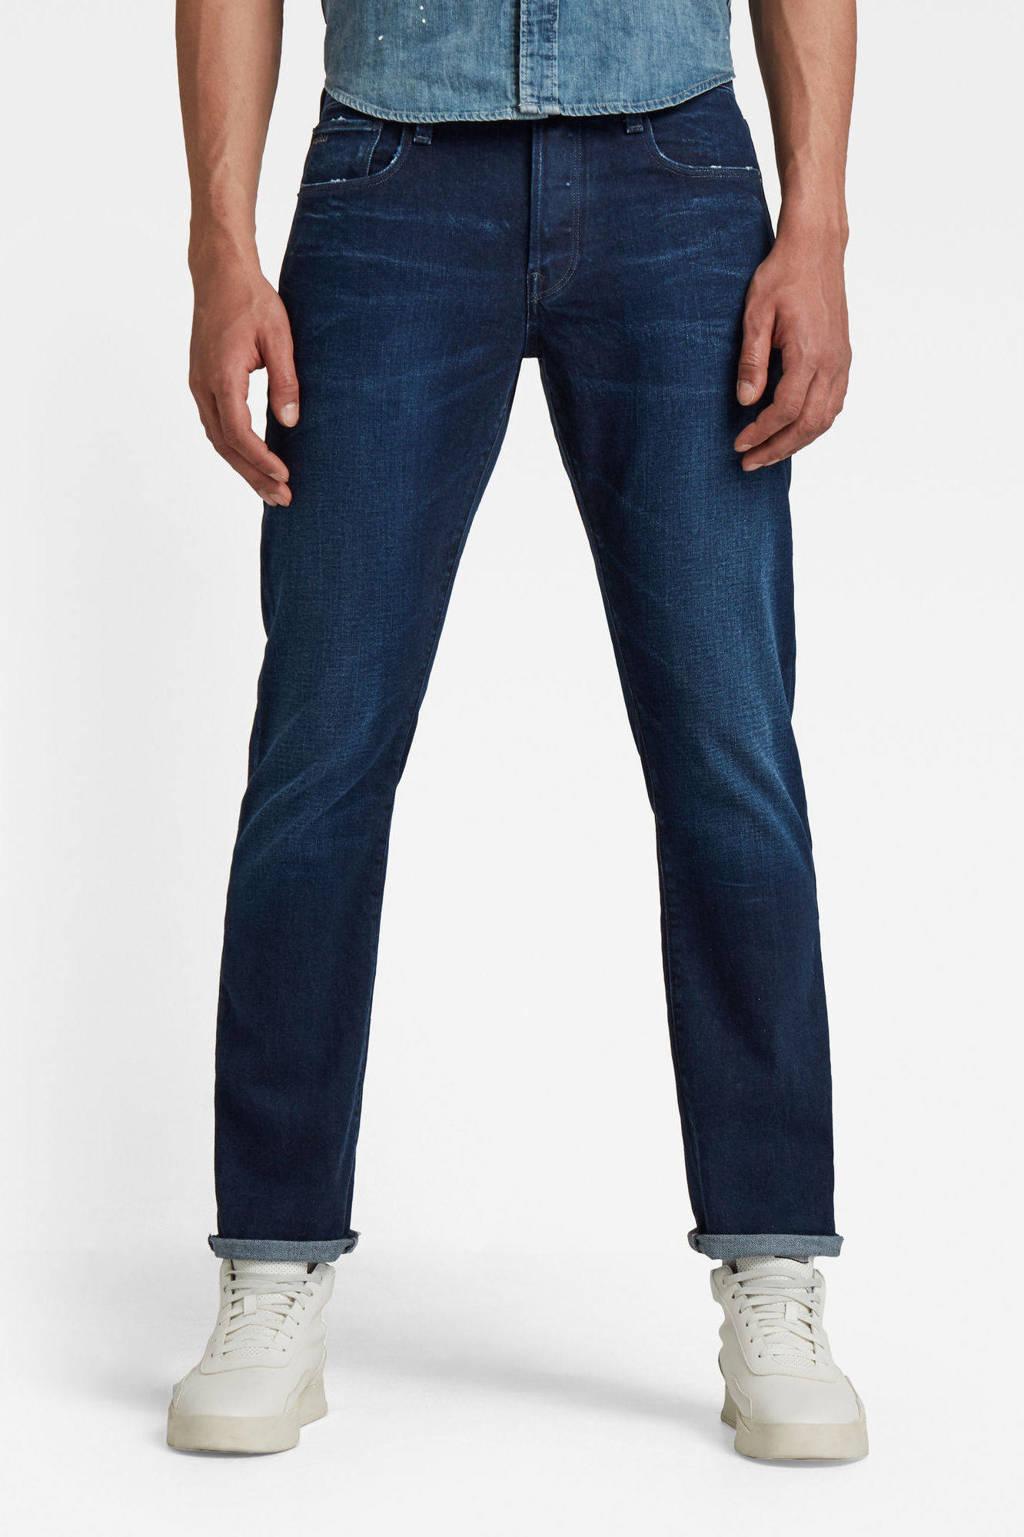 G-Star RAW 3301 straight fit jeans worn in ultramarine